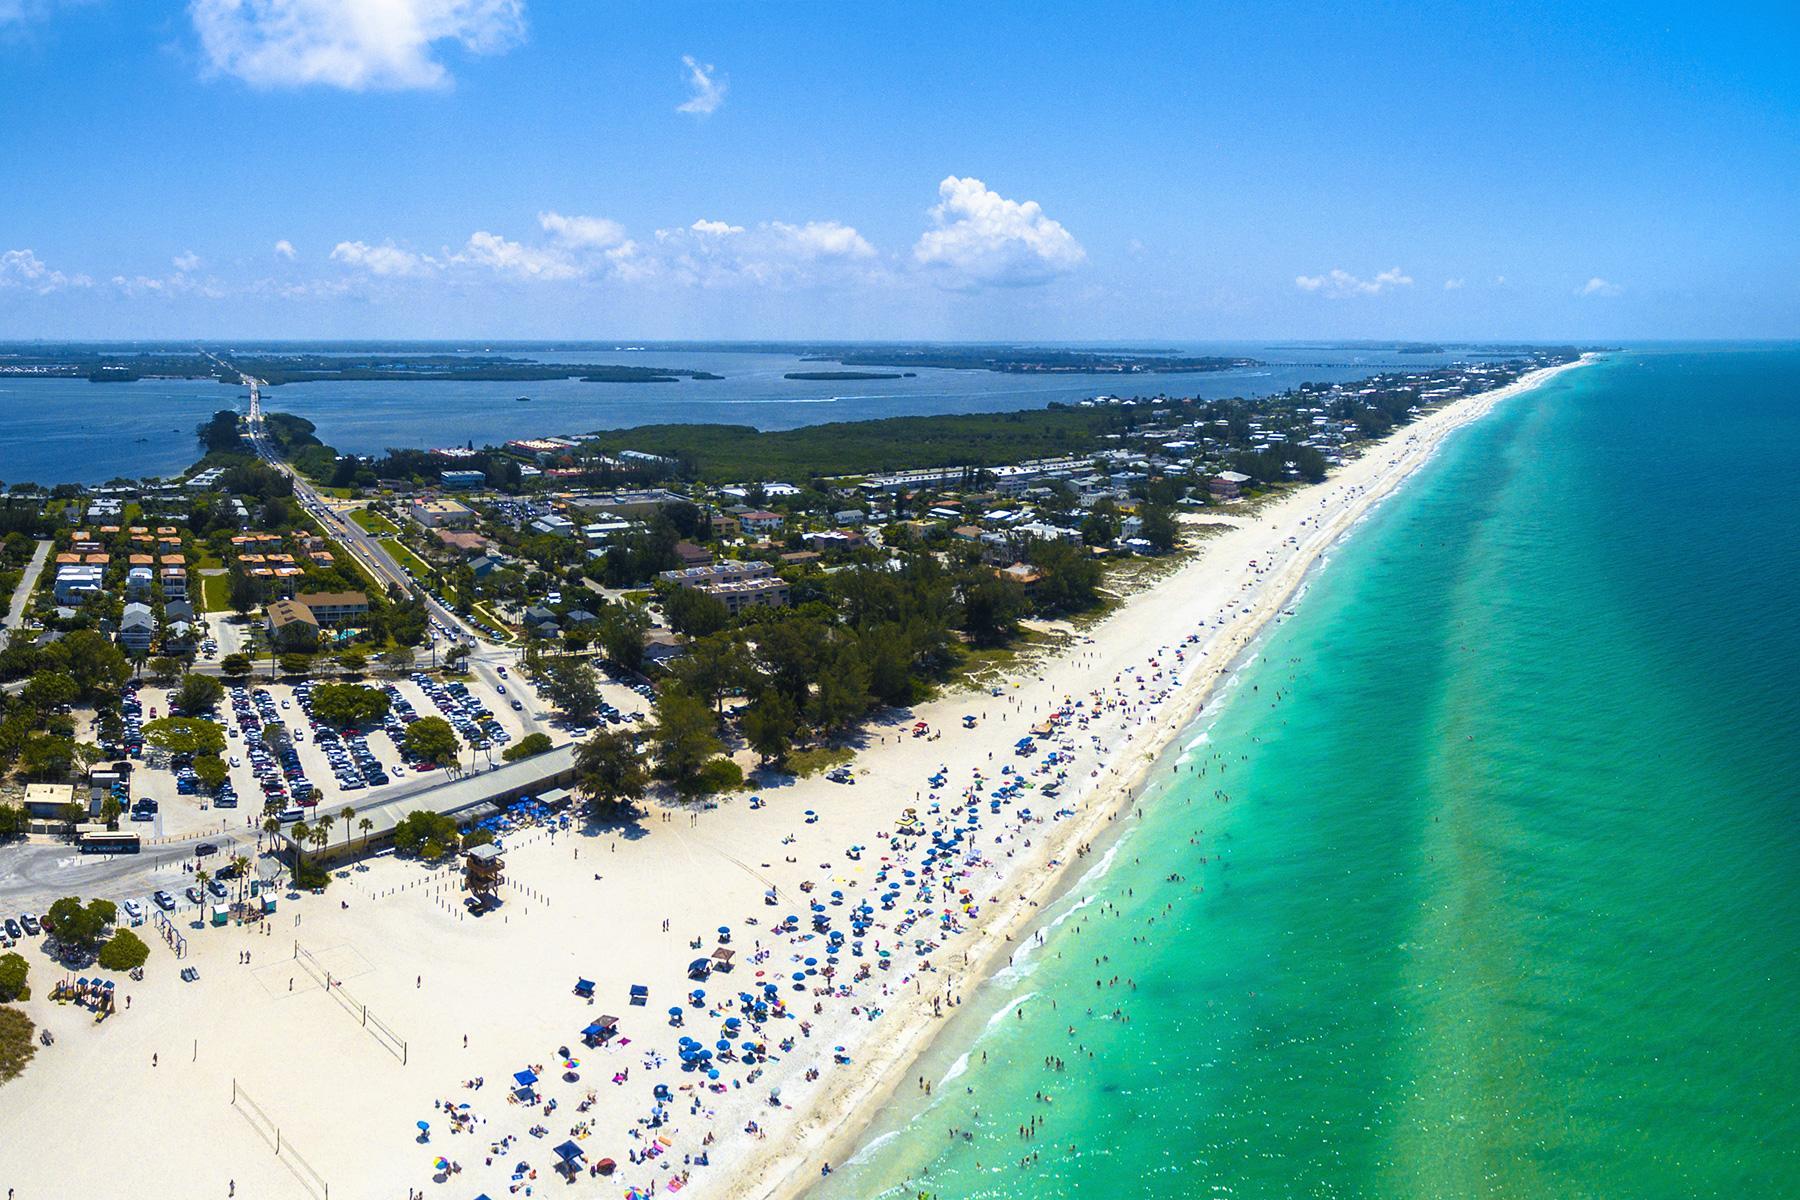 12 Under the Radar Florida Beach Towns to Visit This Winter